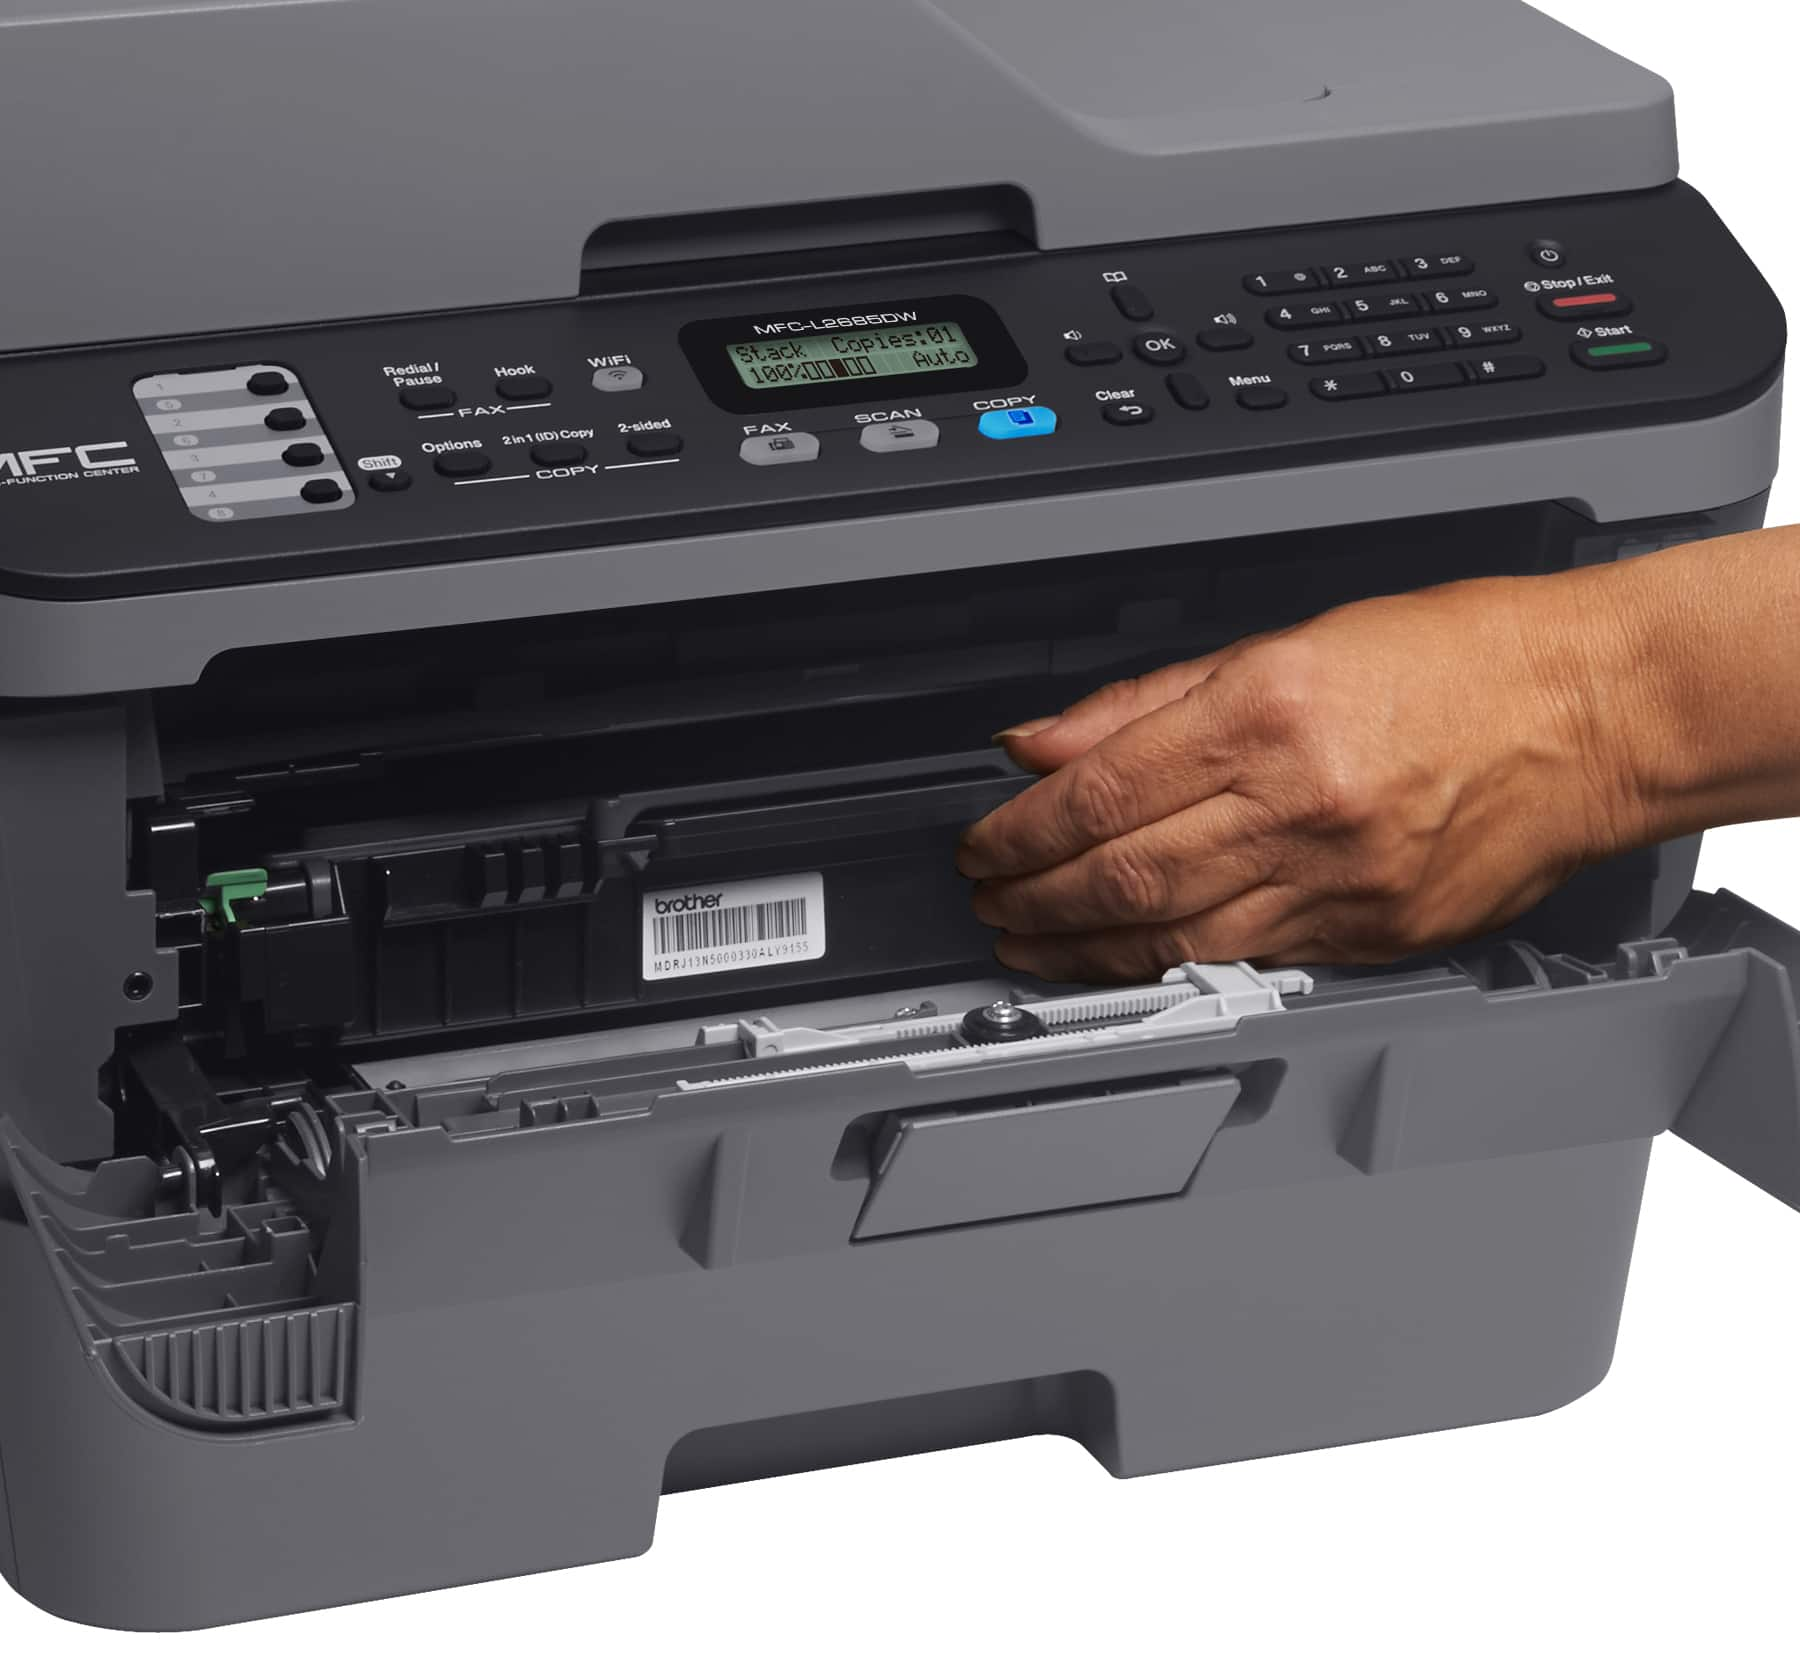 Brother Refurbished MFC L2685DW Monochrome Laser Printer $99.00